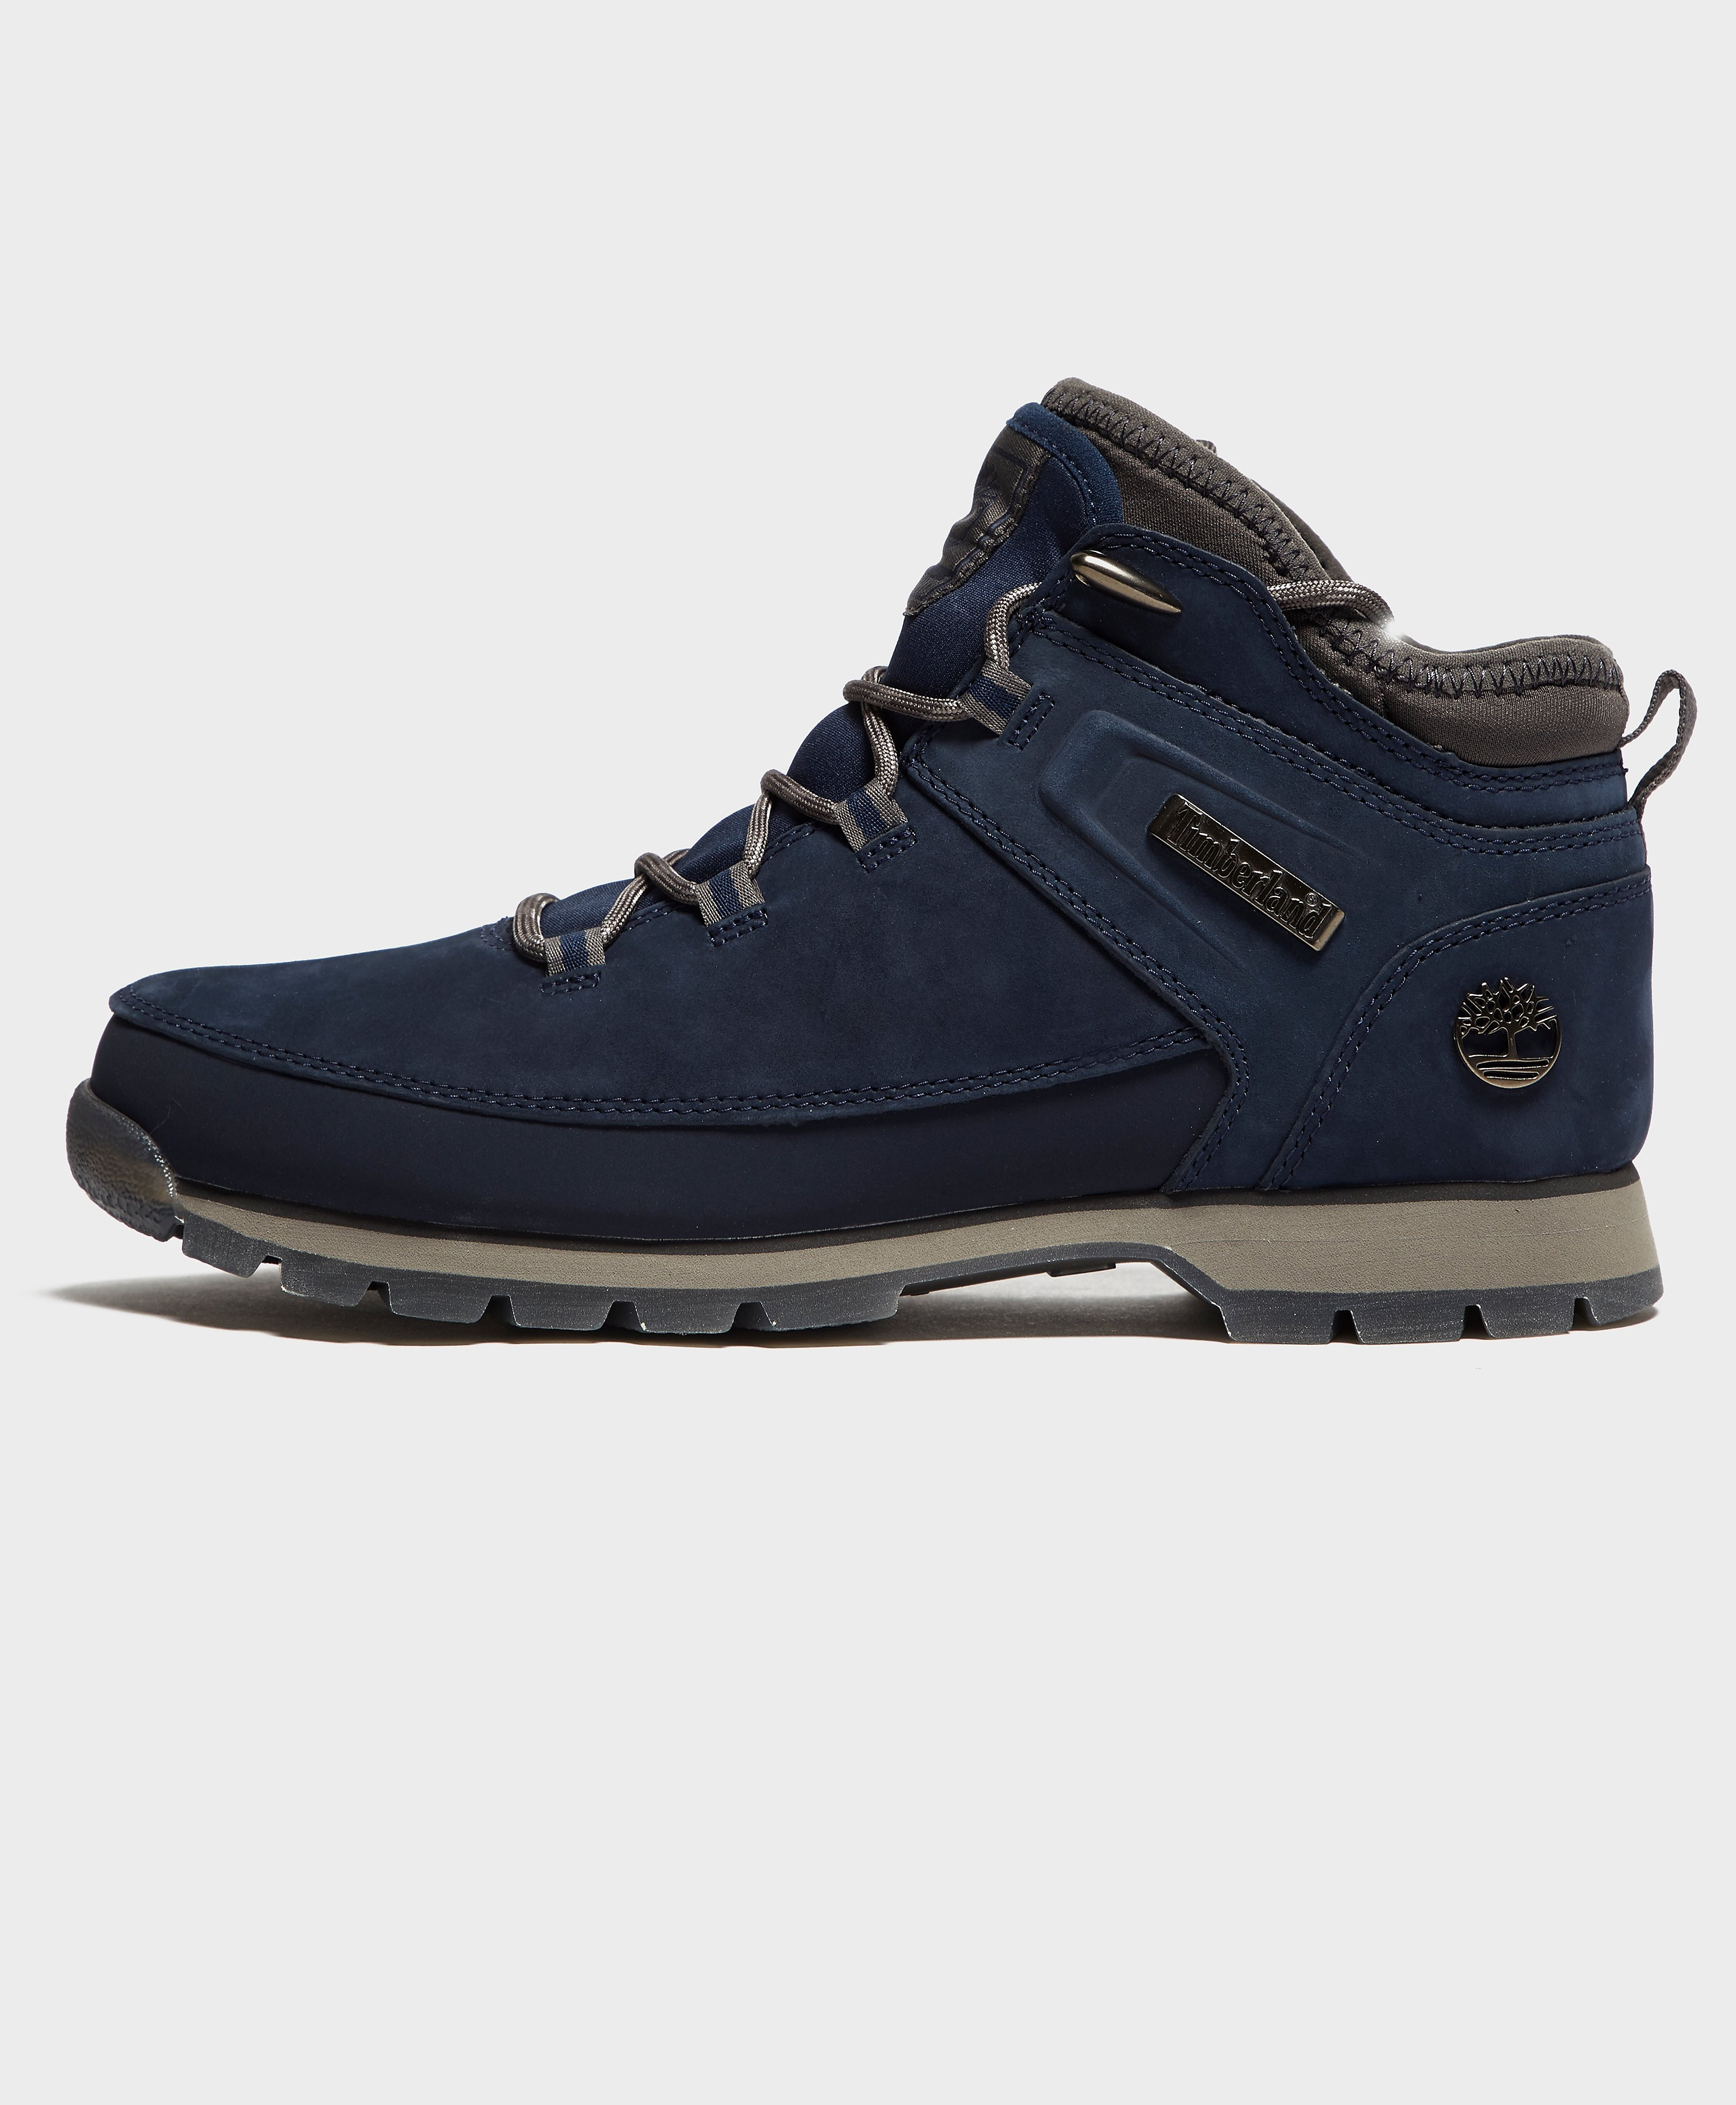 Timberland Eurosprint Boot